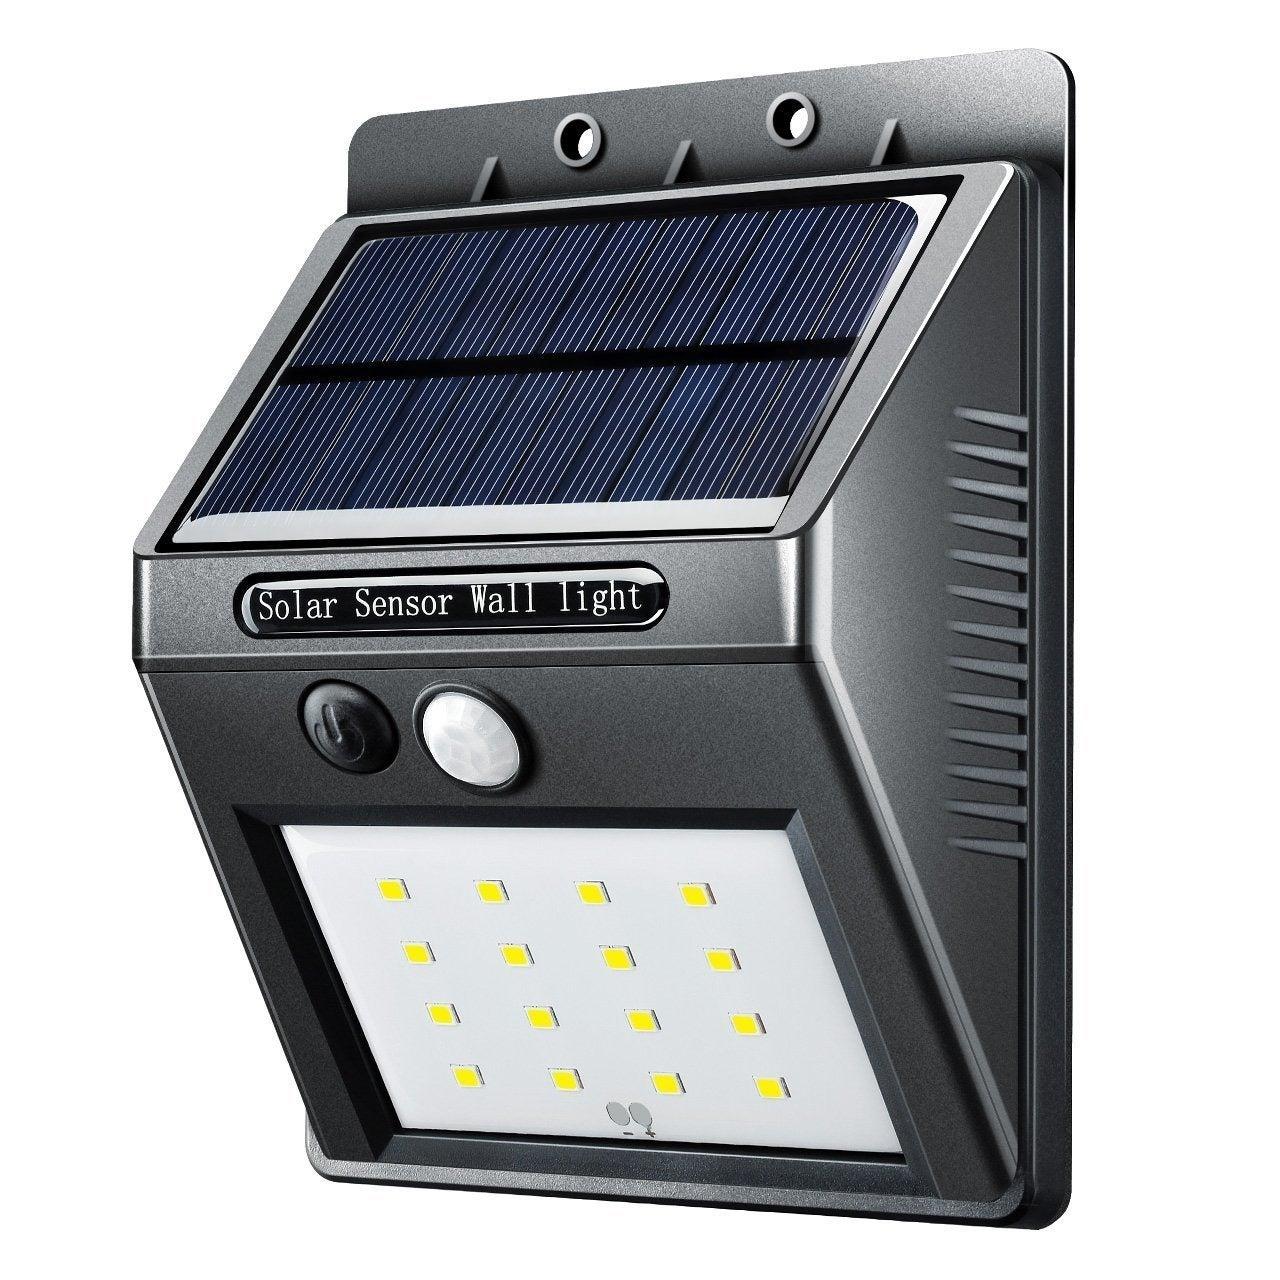 16 Led Solar Panel Ed Motion Sensor Lamp Outdoor Light Garden Security 320lm